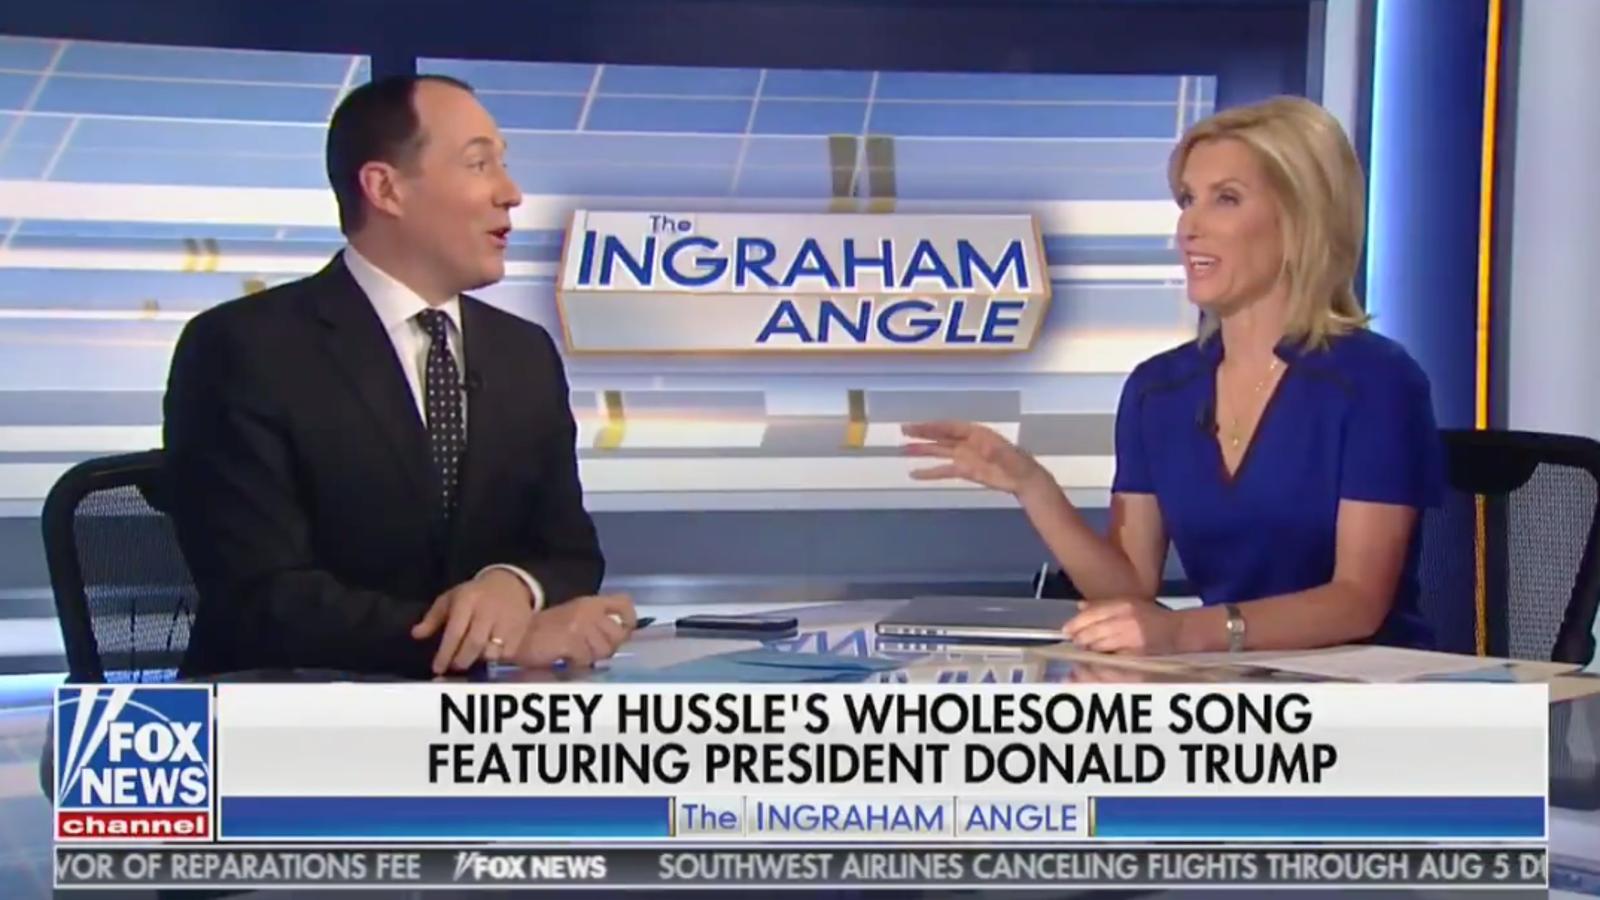 Fox News Host Laura Ingraham Jokes, Laughs During Nipsey